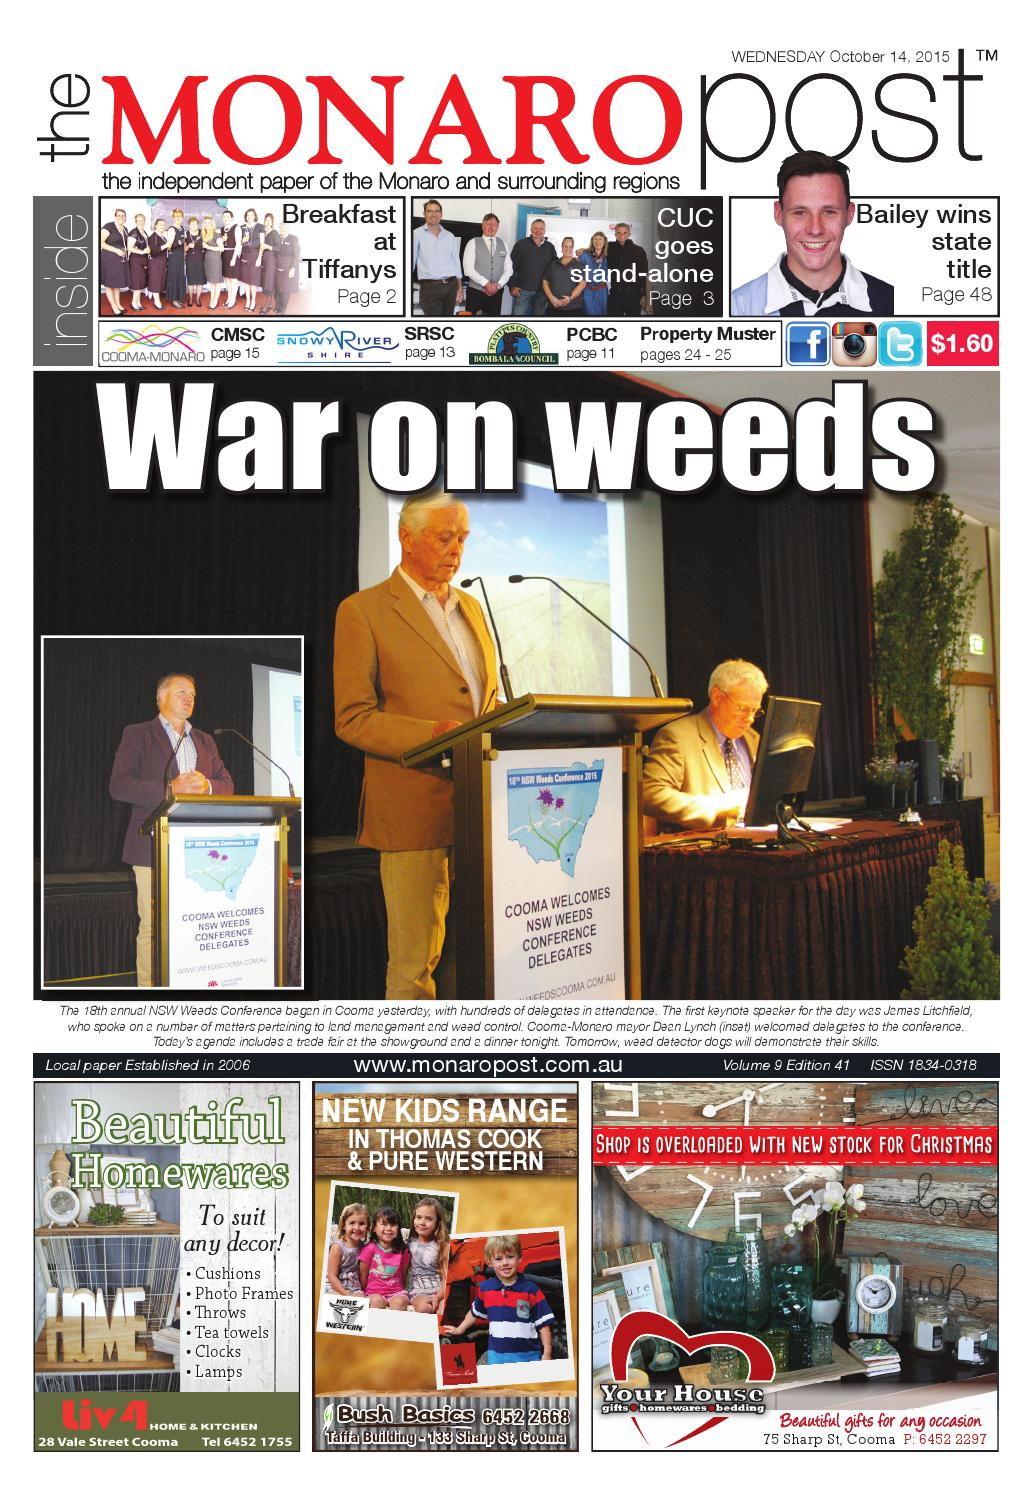 The Monaro Post October 14, 2015 by Monaro Post - issuu